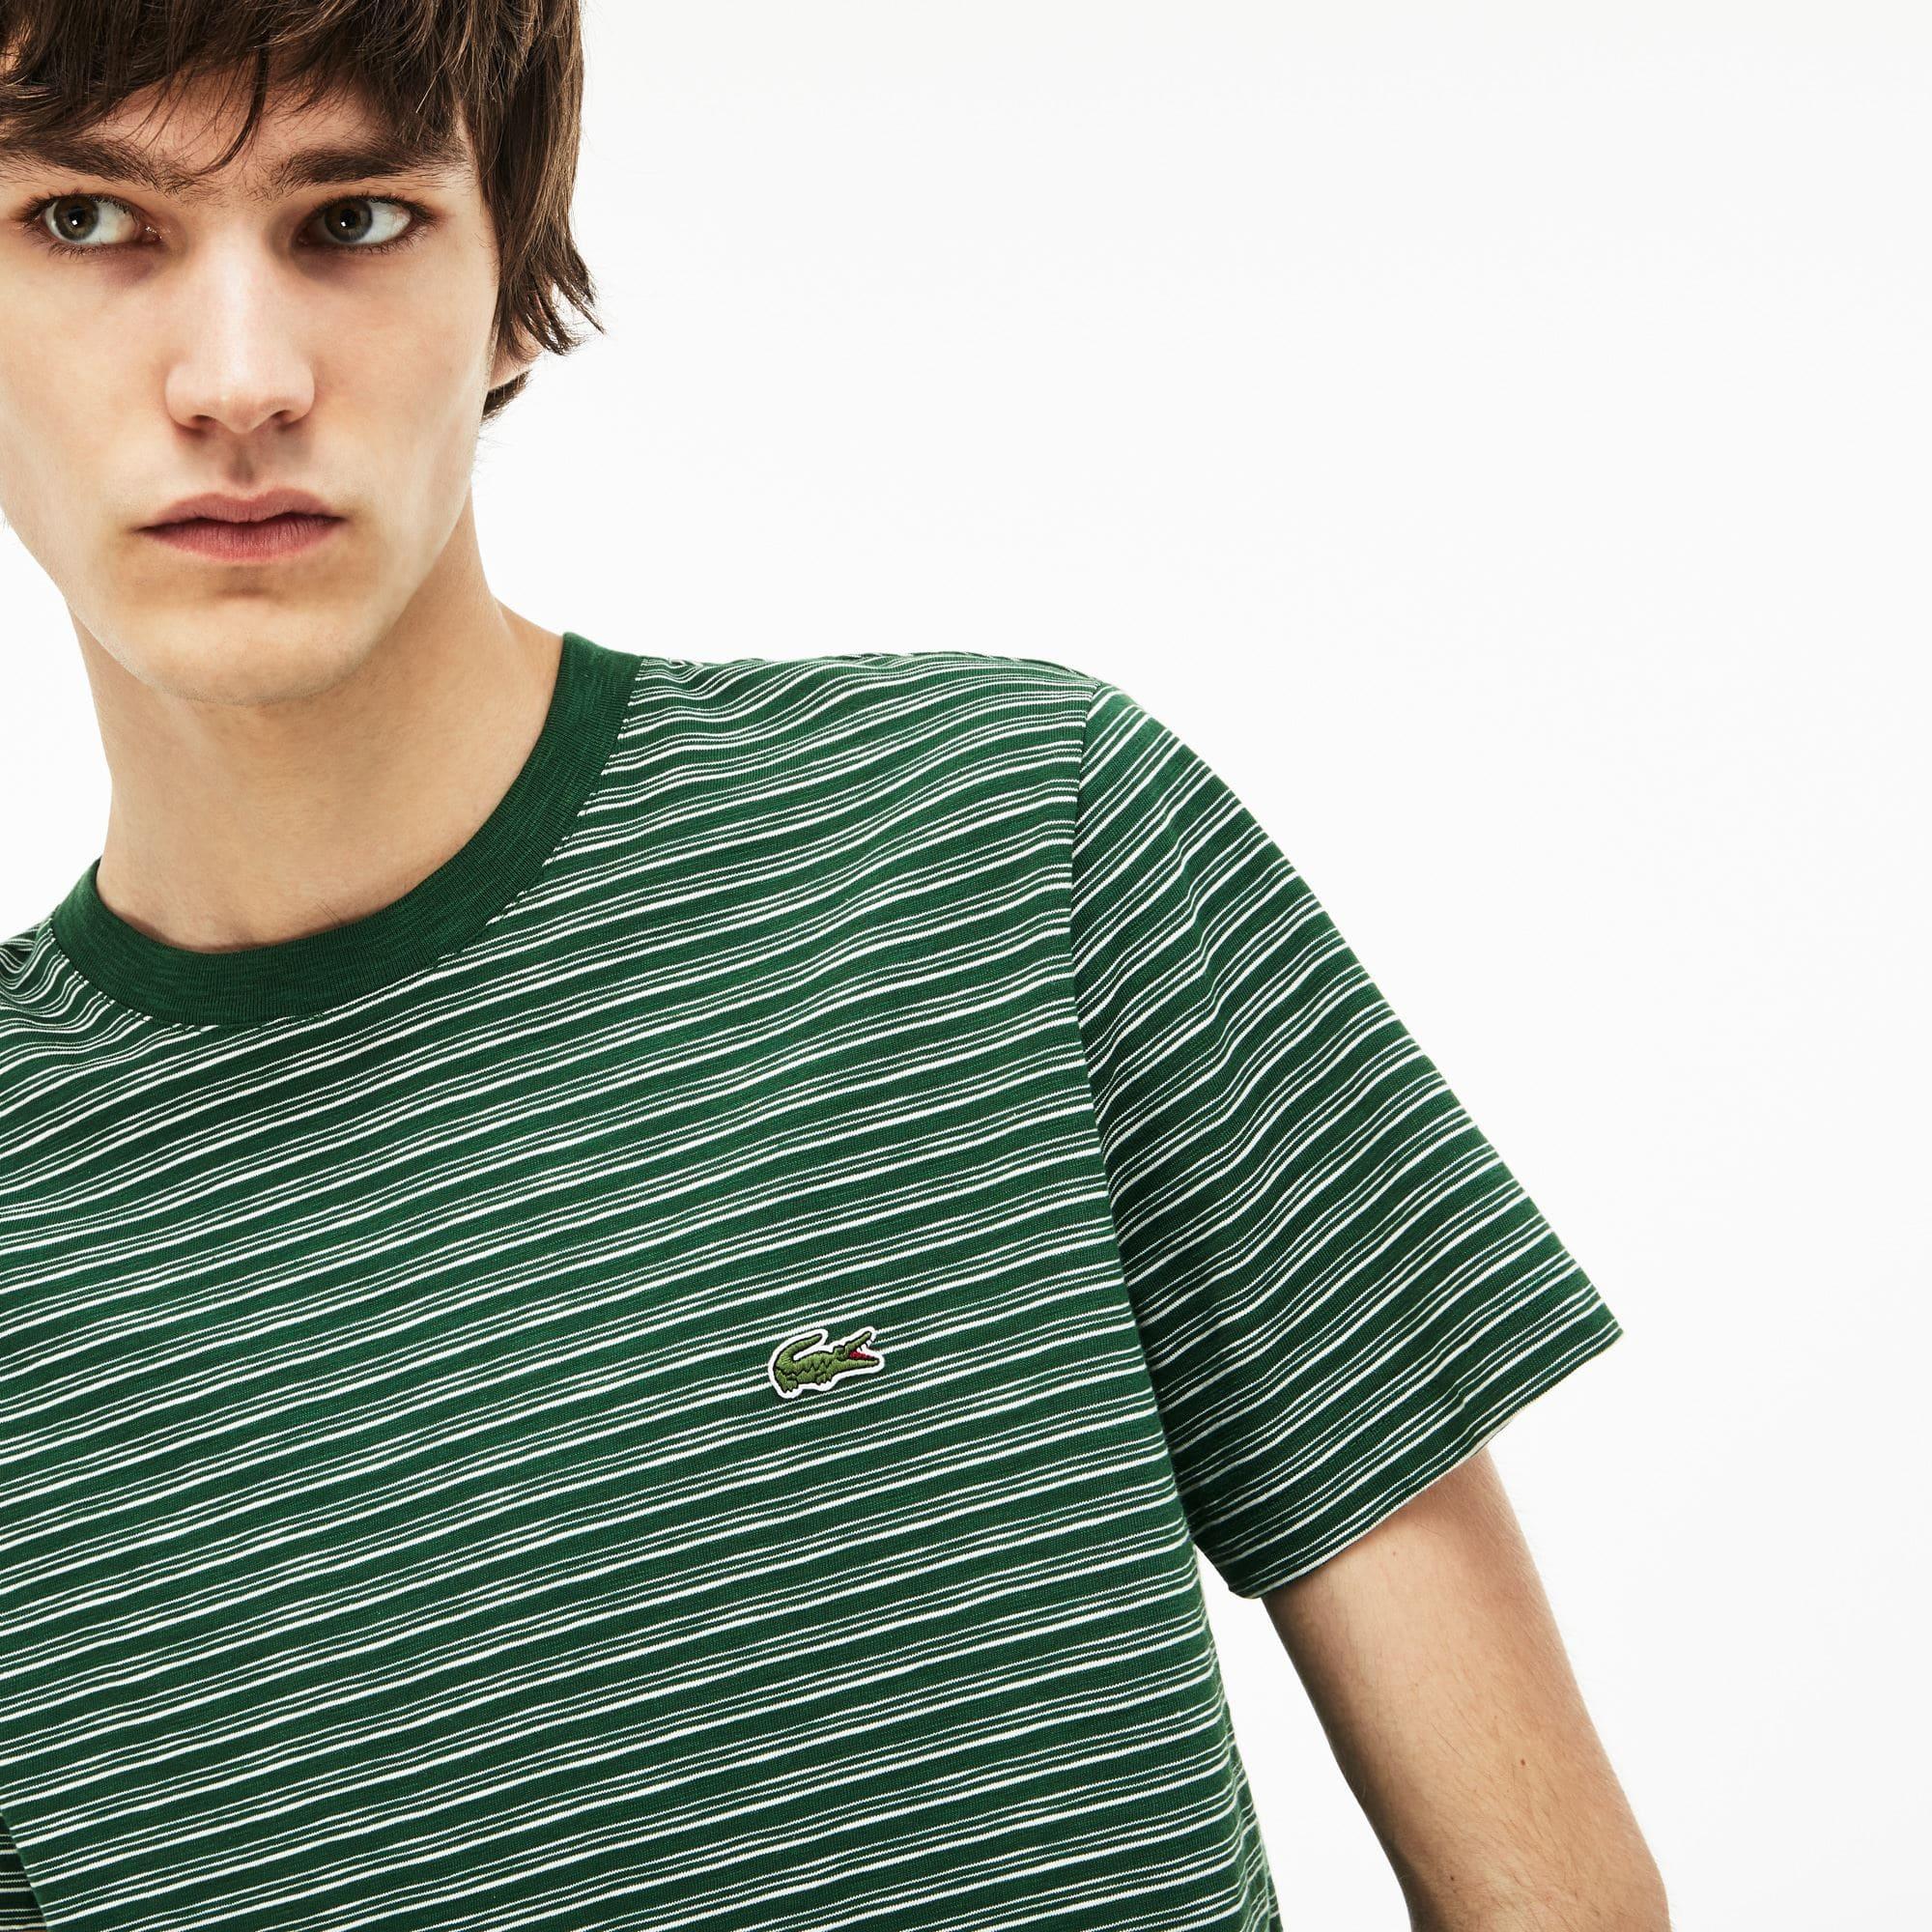 Men's Crew Neck Striped Flamme Cotton Jersey T-shirt